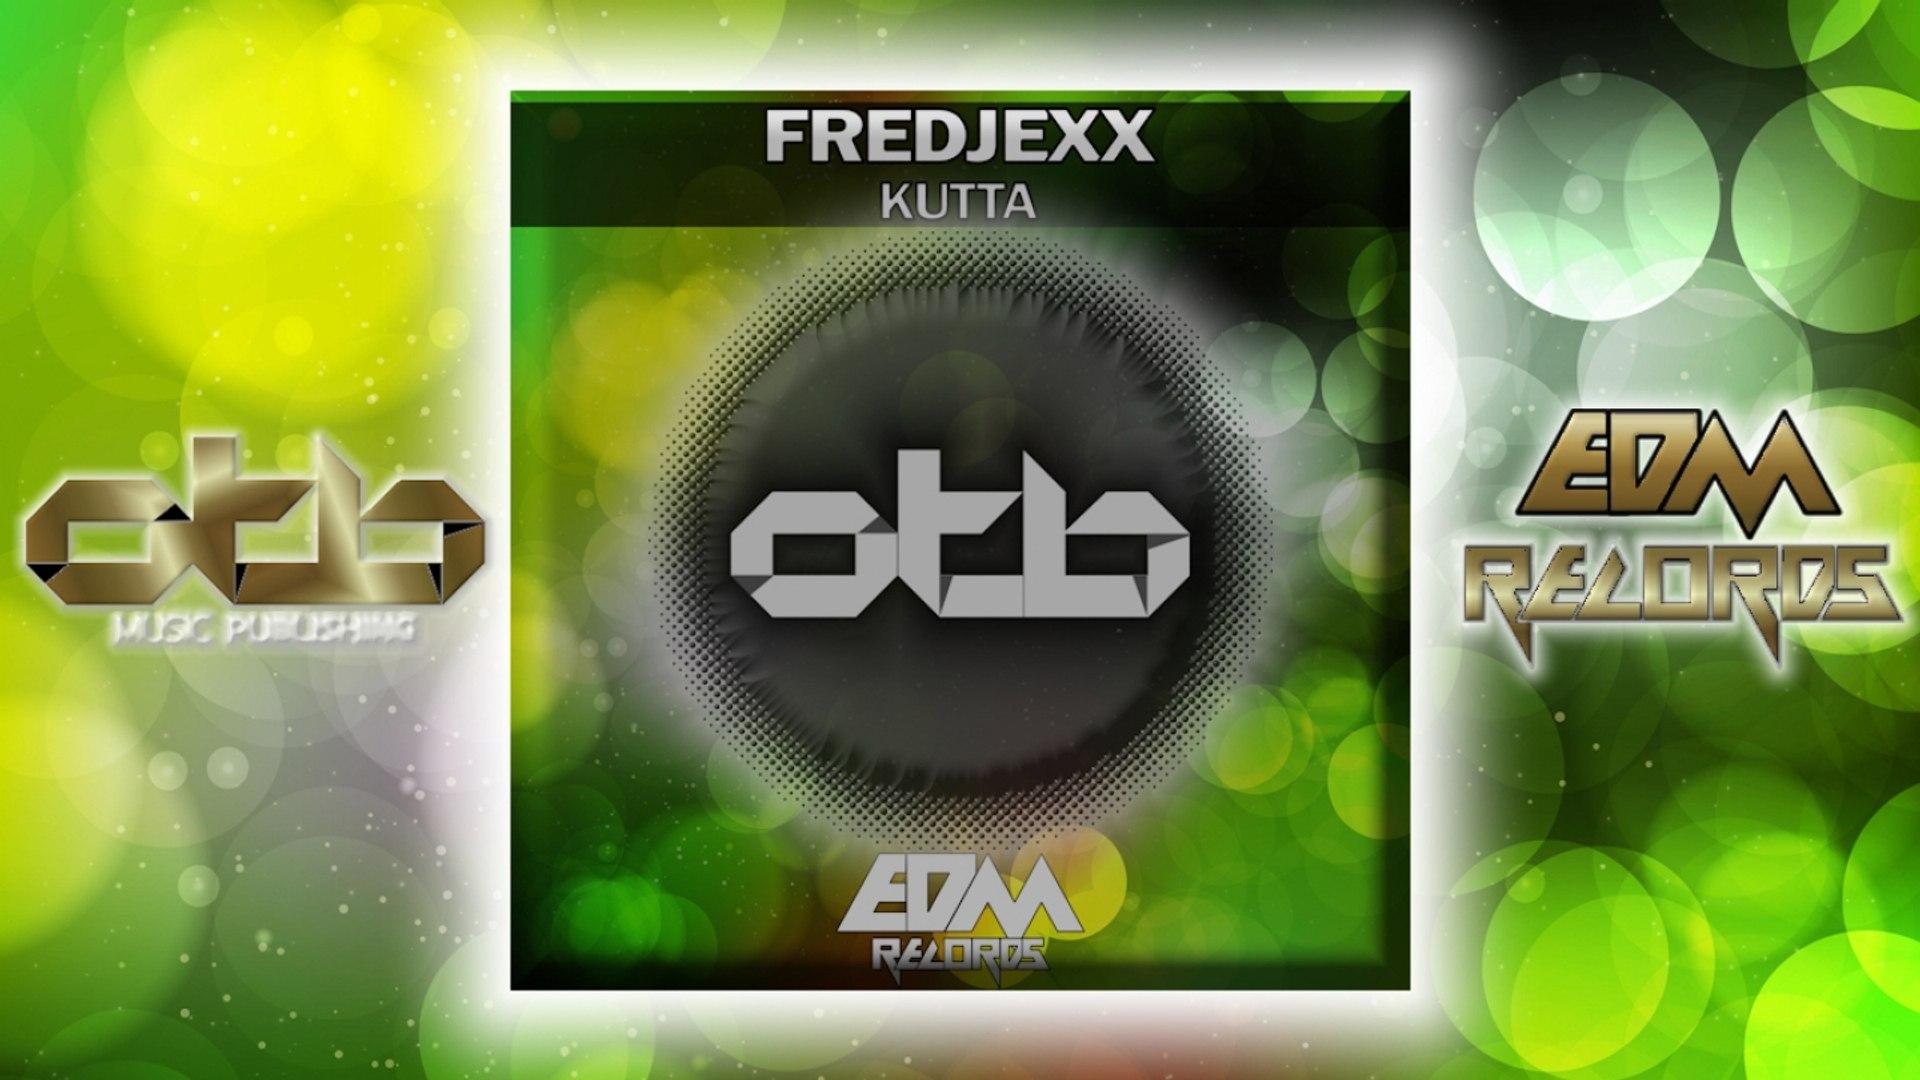 Fredjexx - Kutta - [EDM 2018]